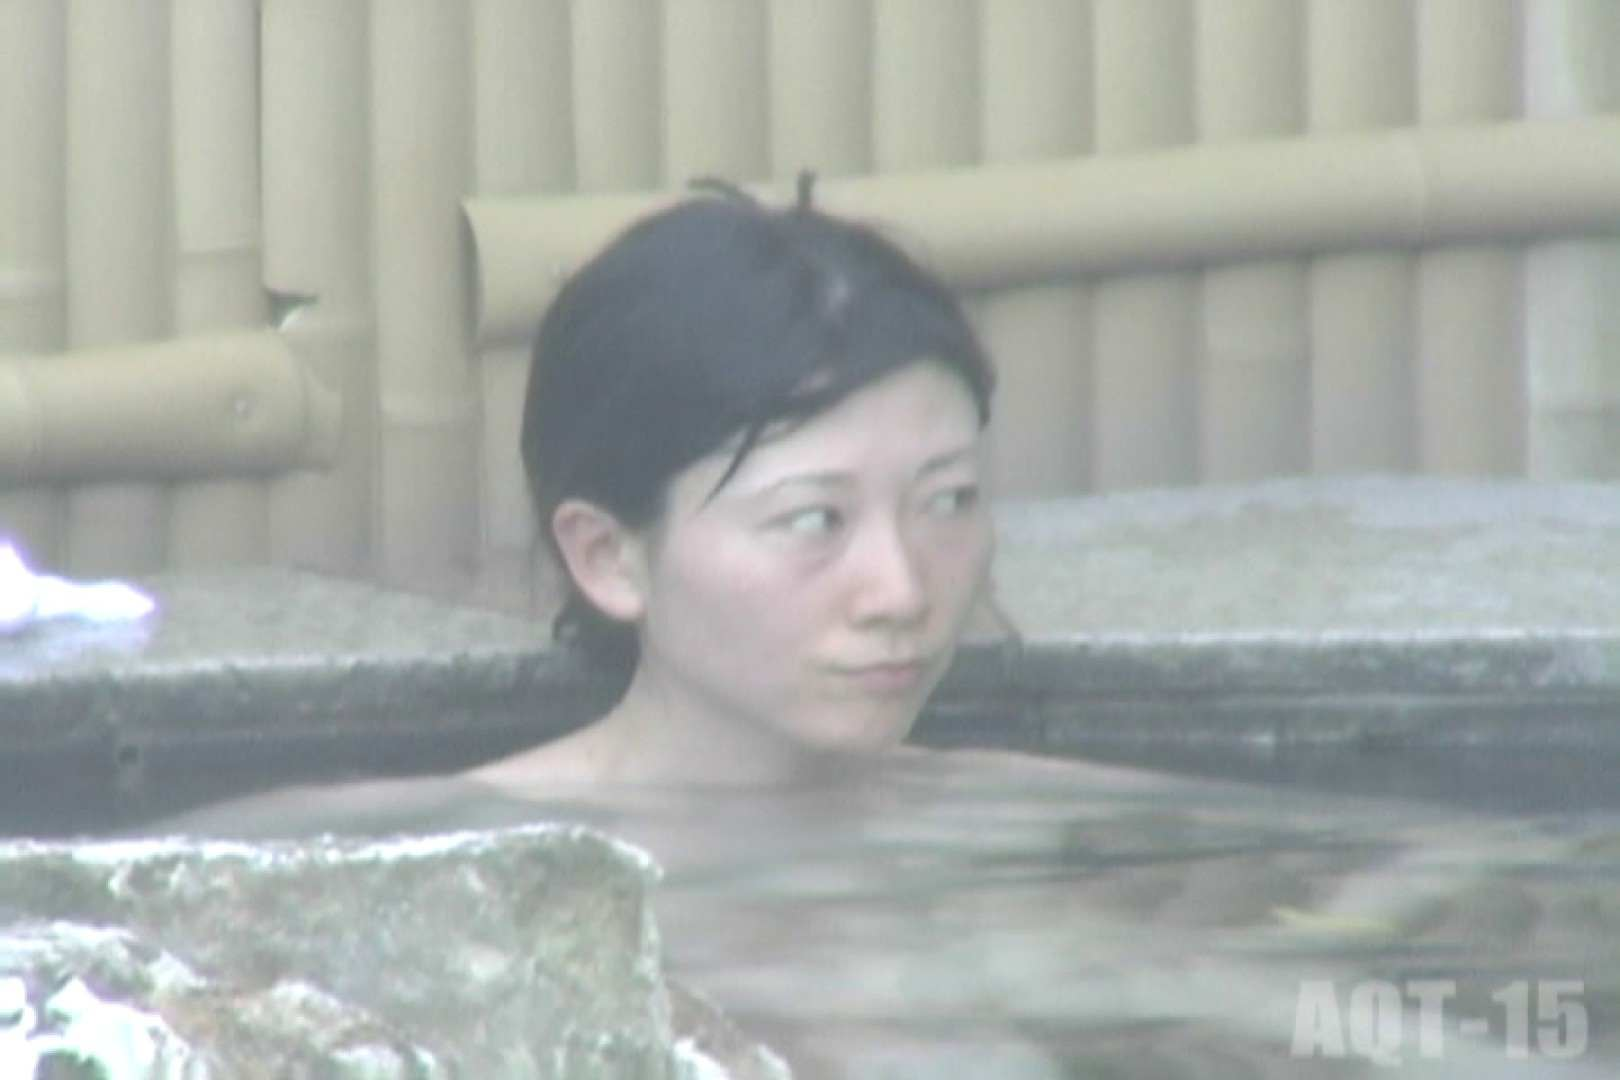 Aquaな露天風呂Vol.835 盗撮シリーズ   露天風呂編  92PIX 41